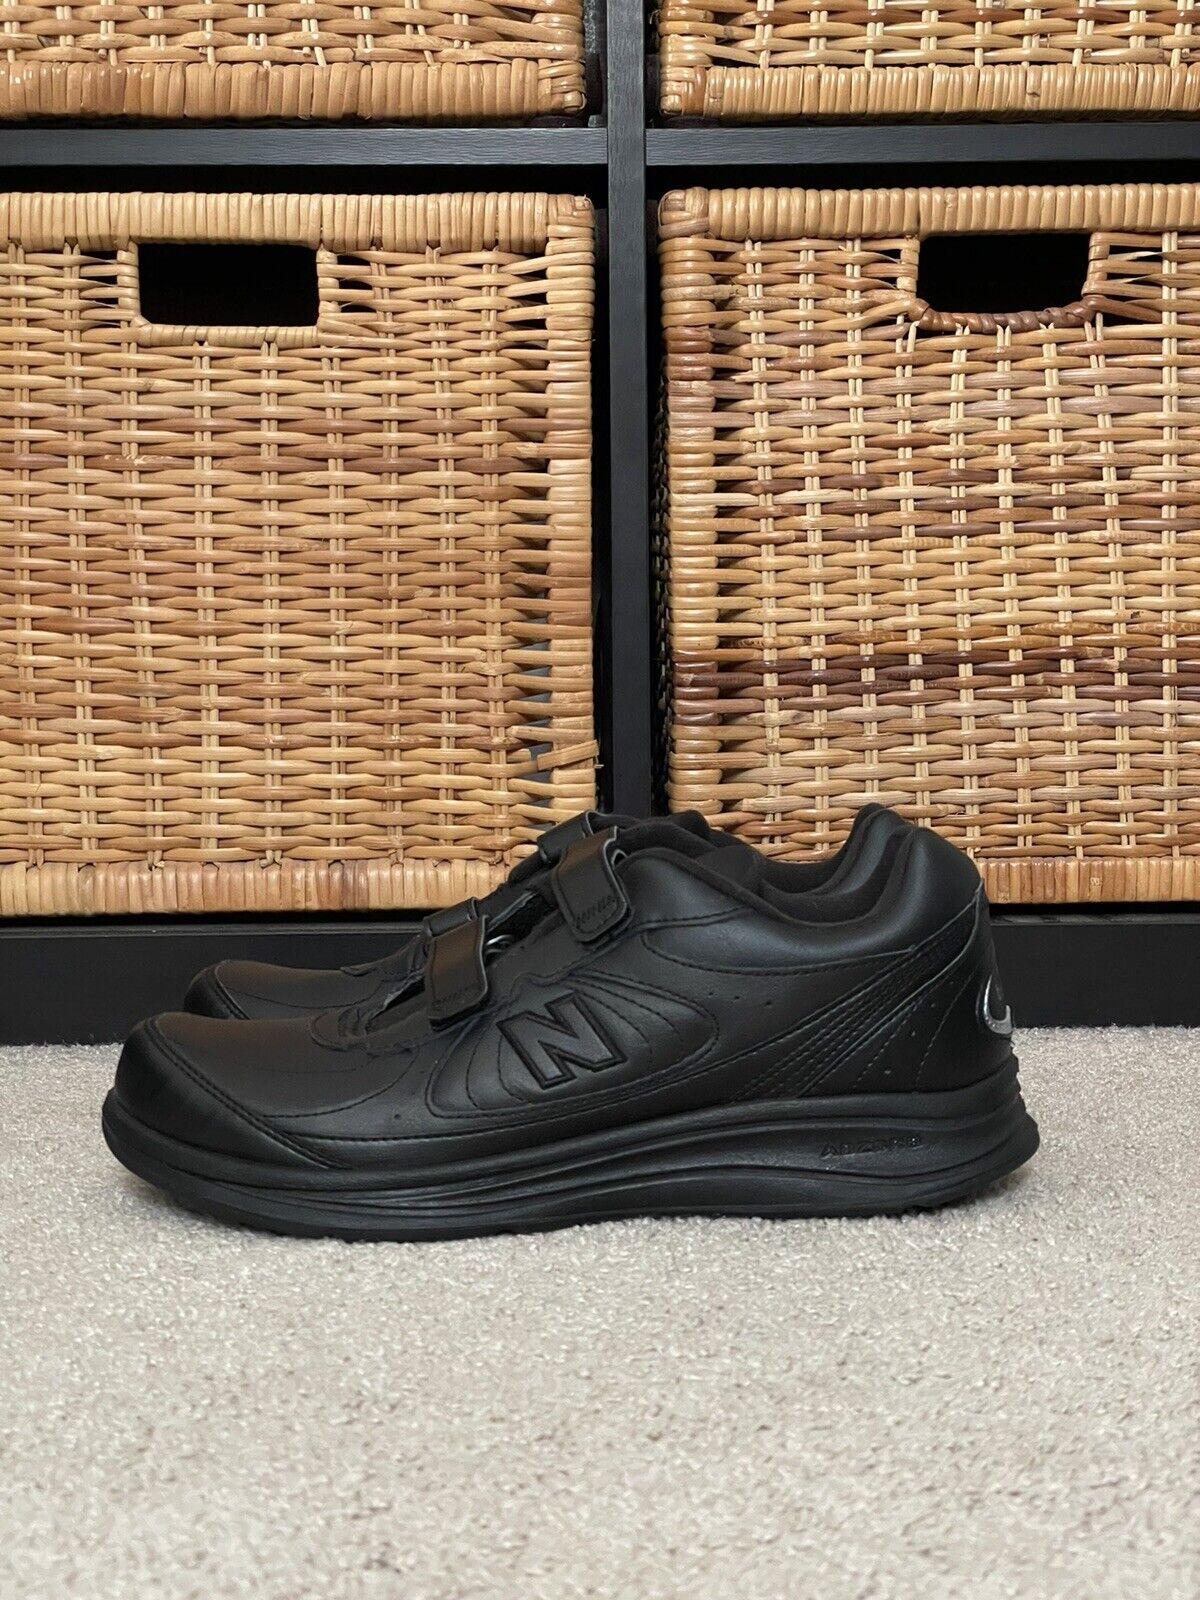 New Balance 577 MW577VK Hook & Loop Leather Sneakers, Men's Size 11 D Black